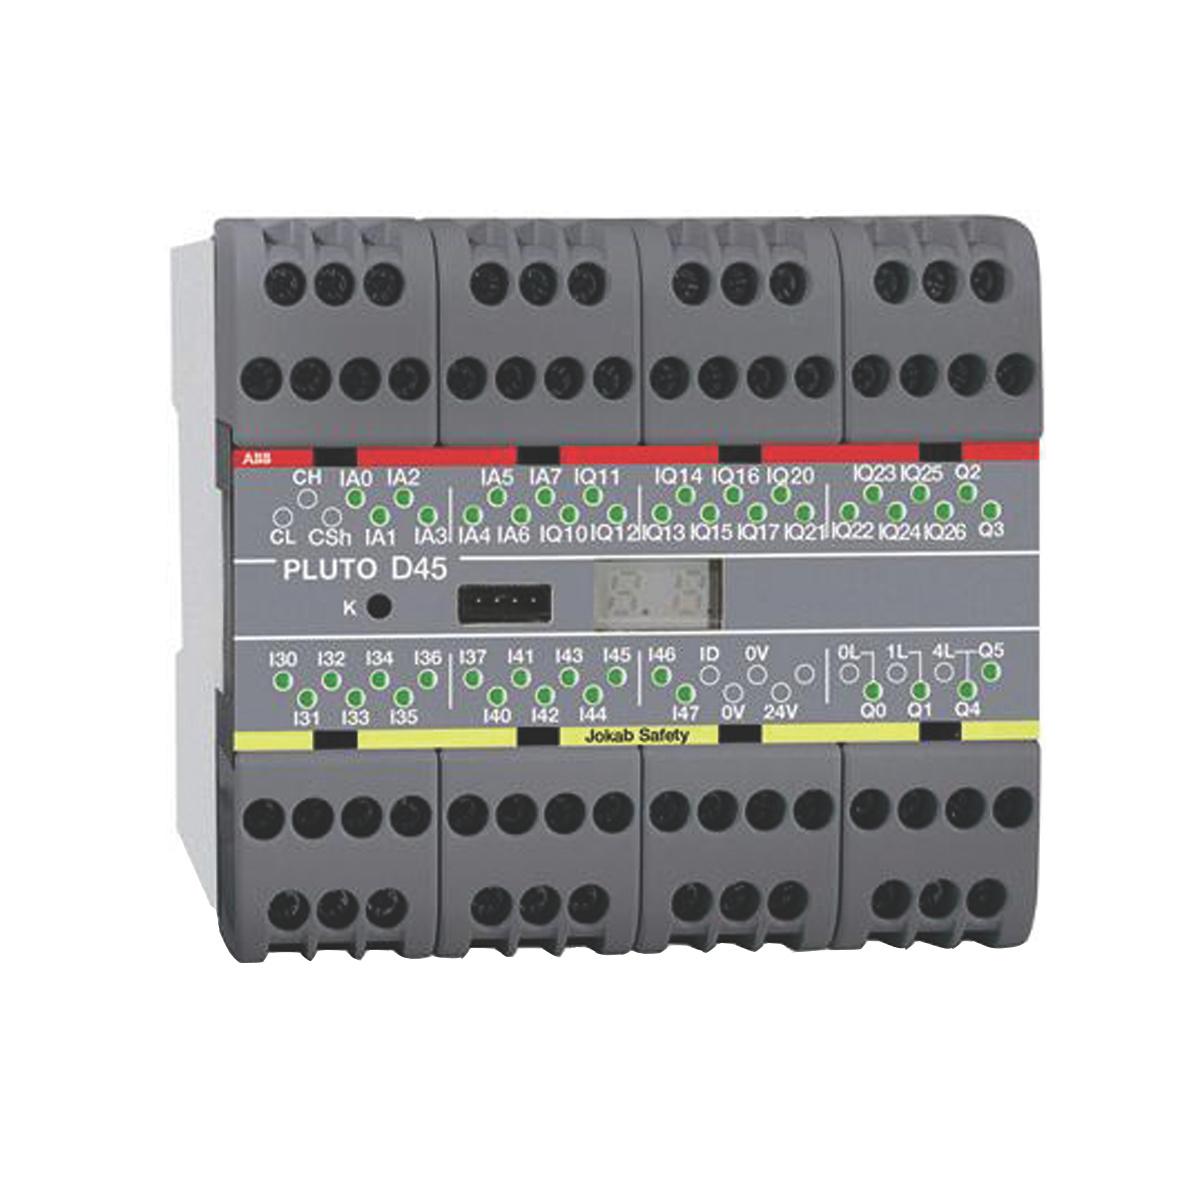 ABB 2TLA020070R6600 Programmable Logic Controller